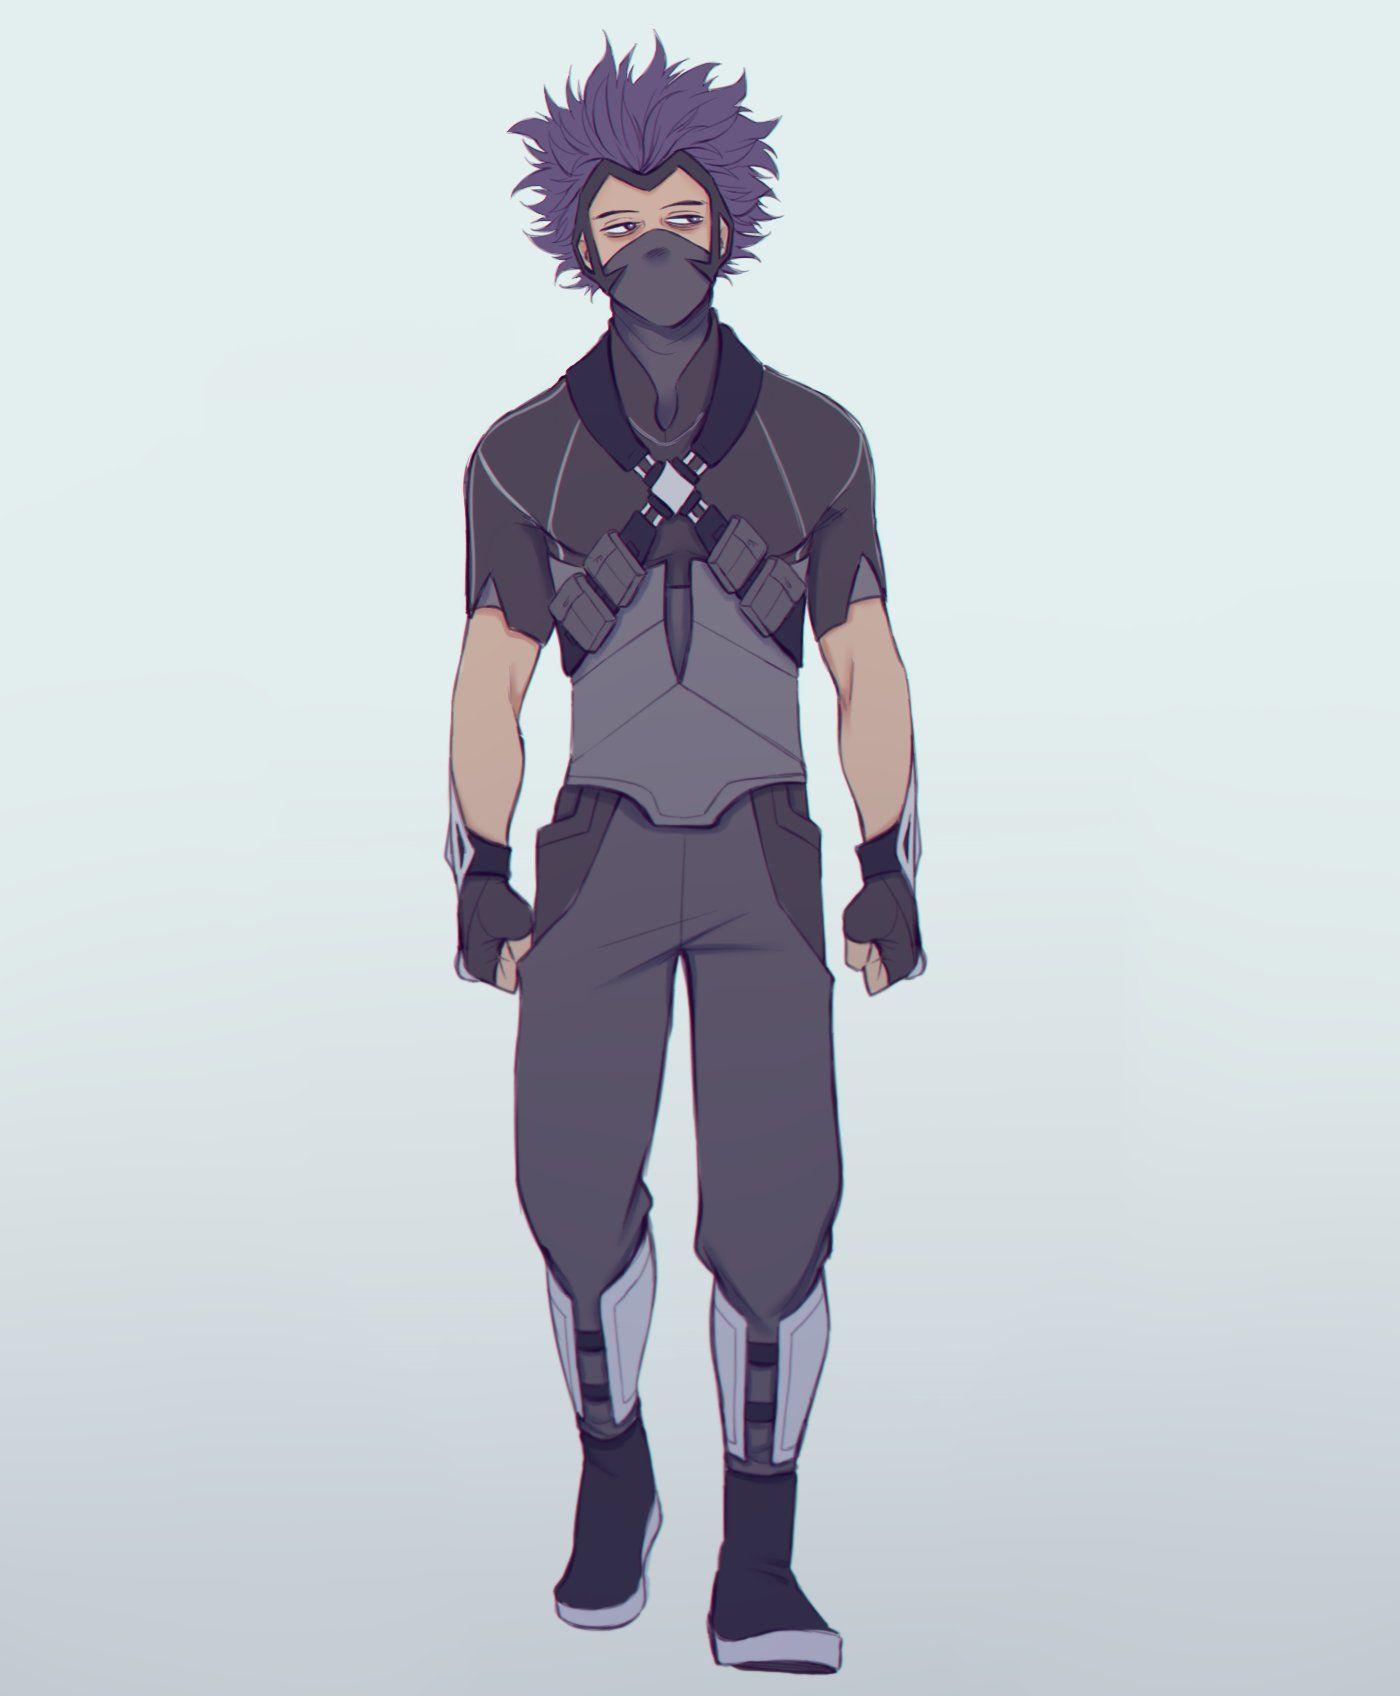 Kᴇɪɪᴅ On Twitter Shinsou S Hero Costume Design Hero Costumes My Hero Boku No Hero Academia